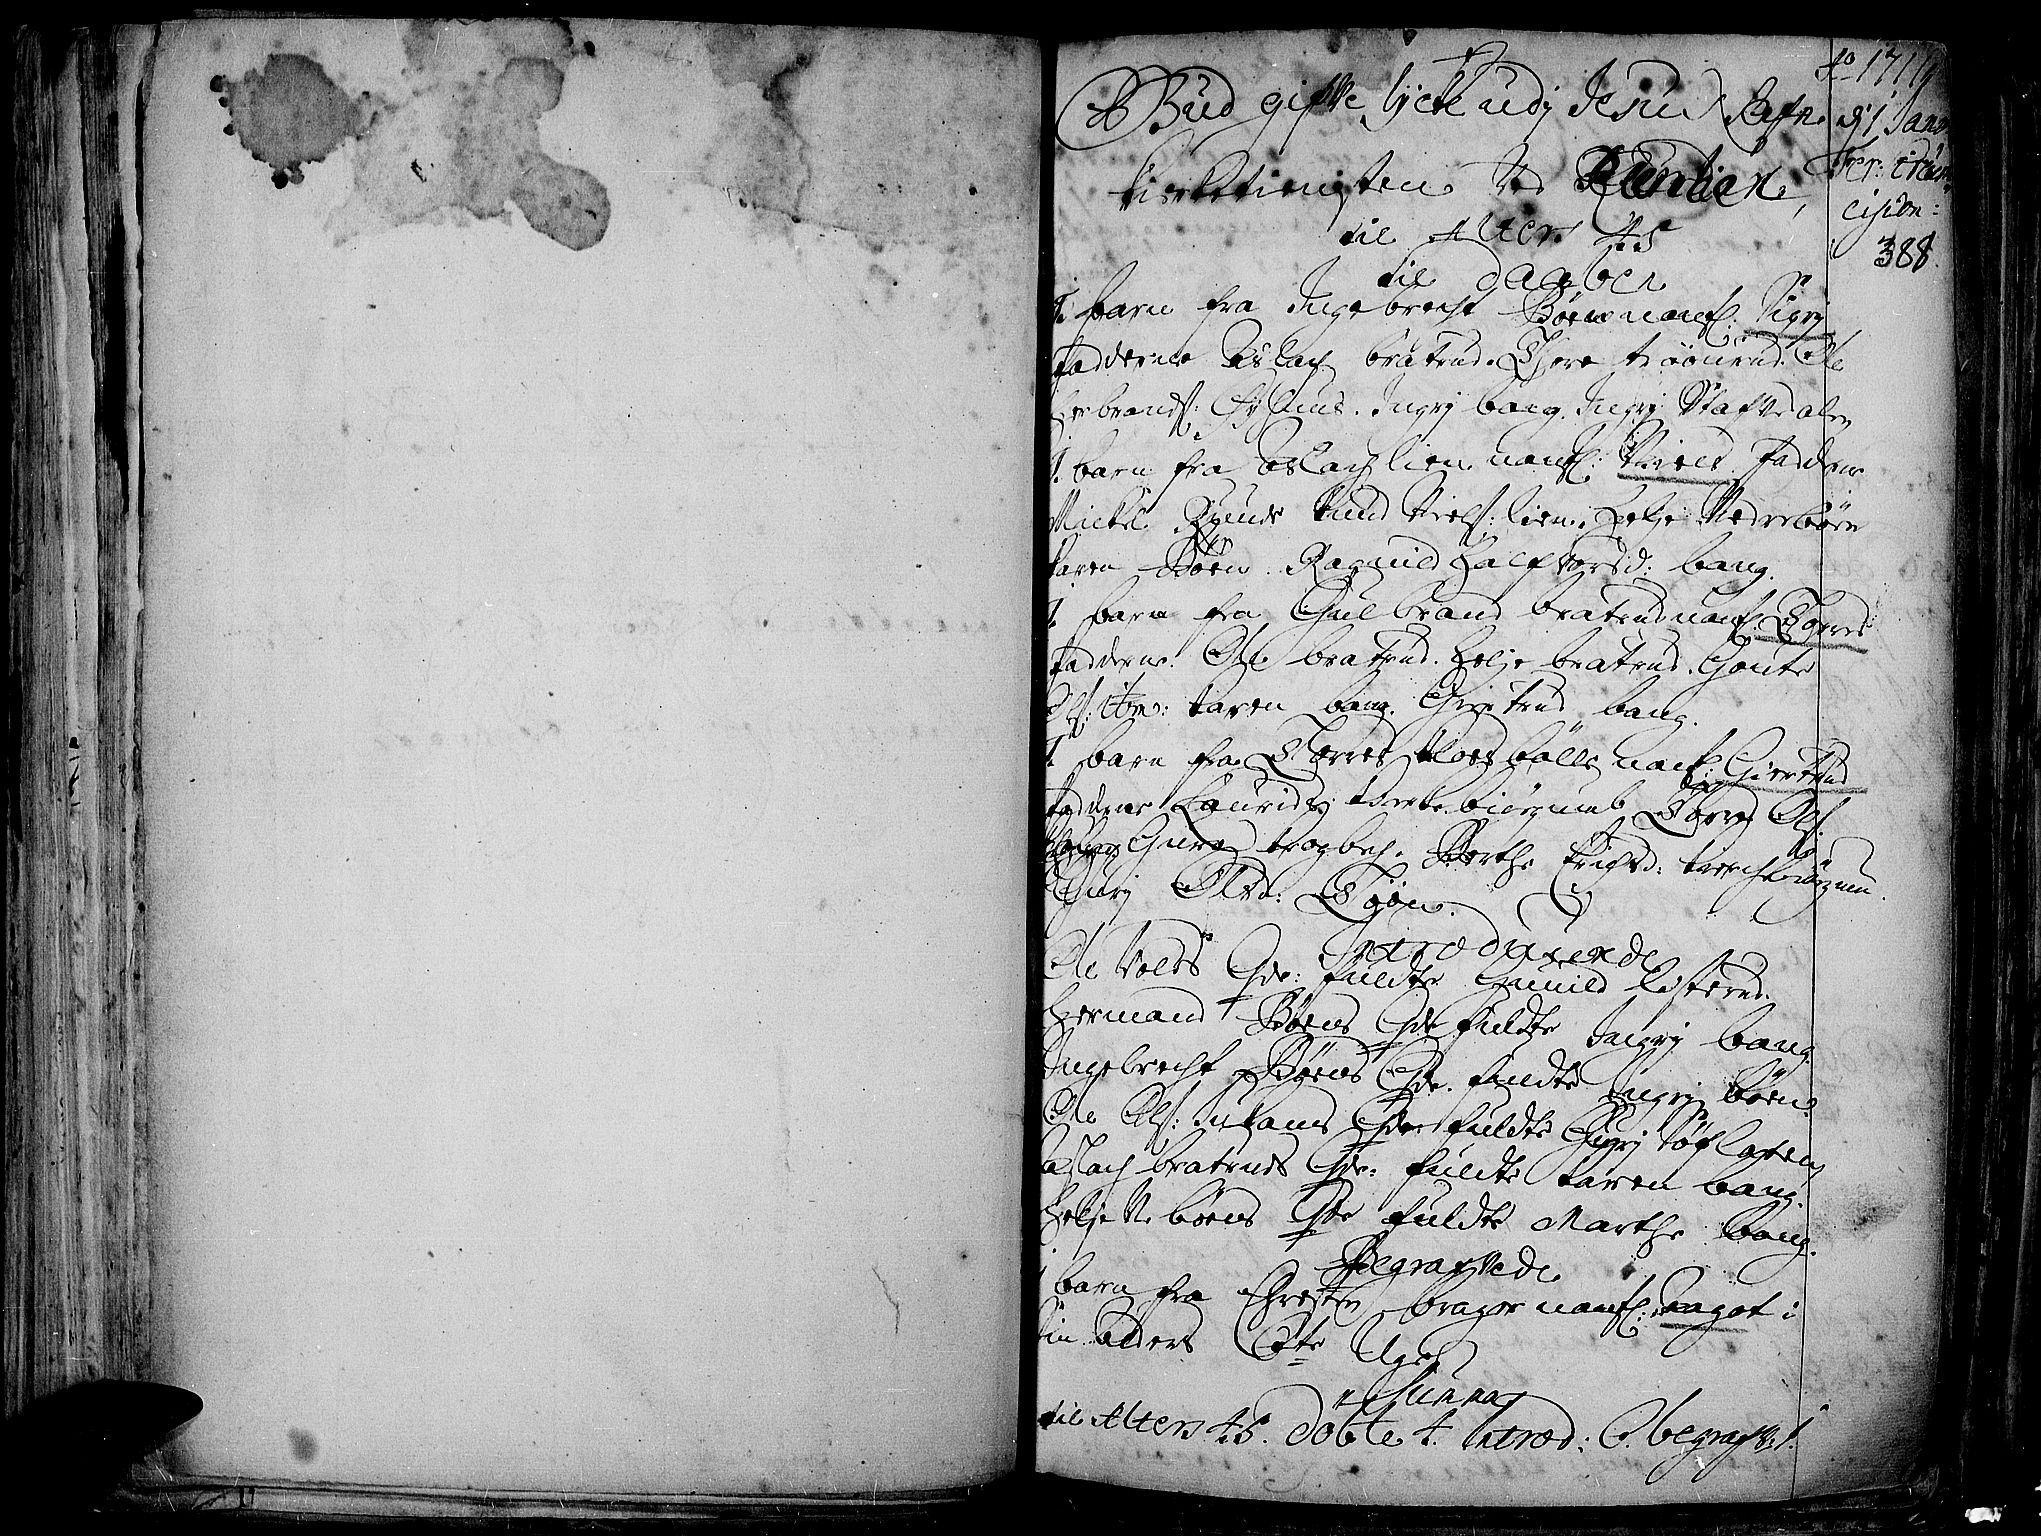 SAH, Aurdal prestekontor, Ministerialbok nr. 1-3, 1692-1730, s. 388